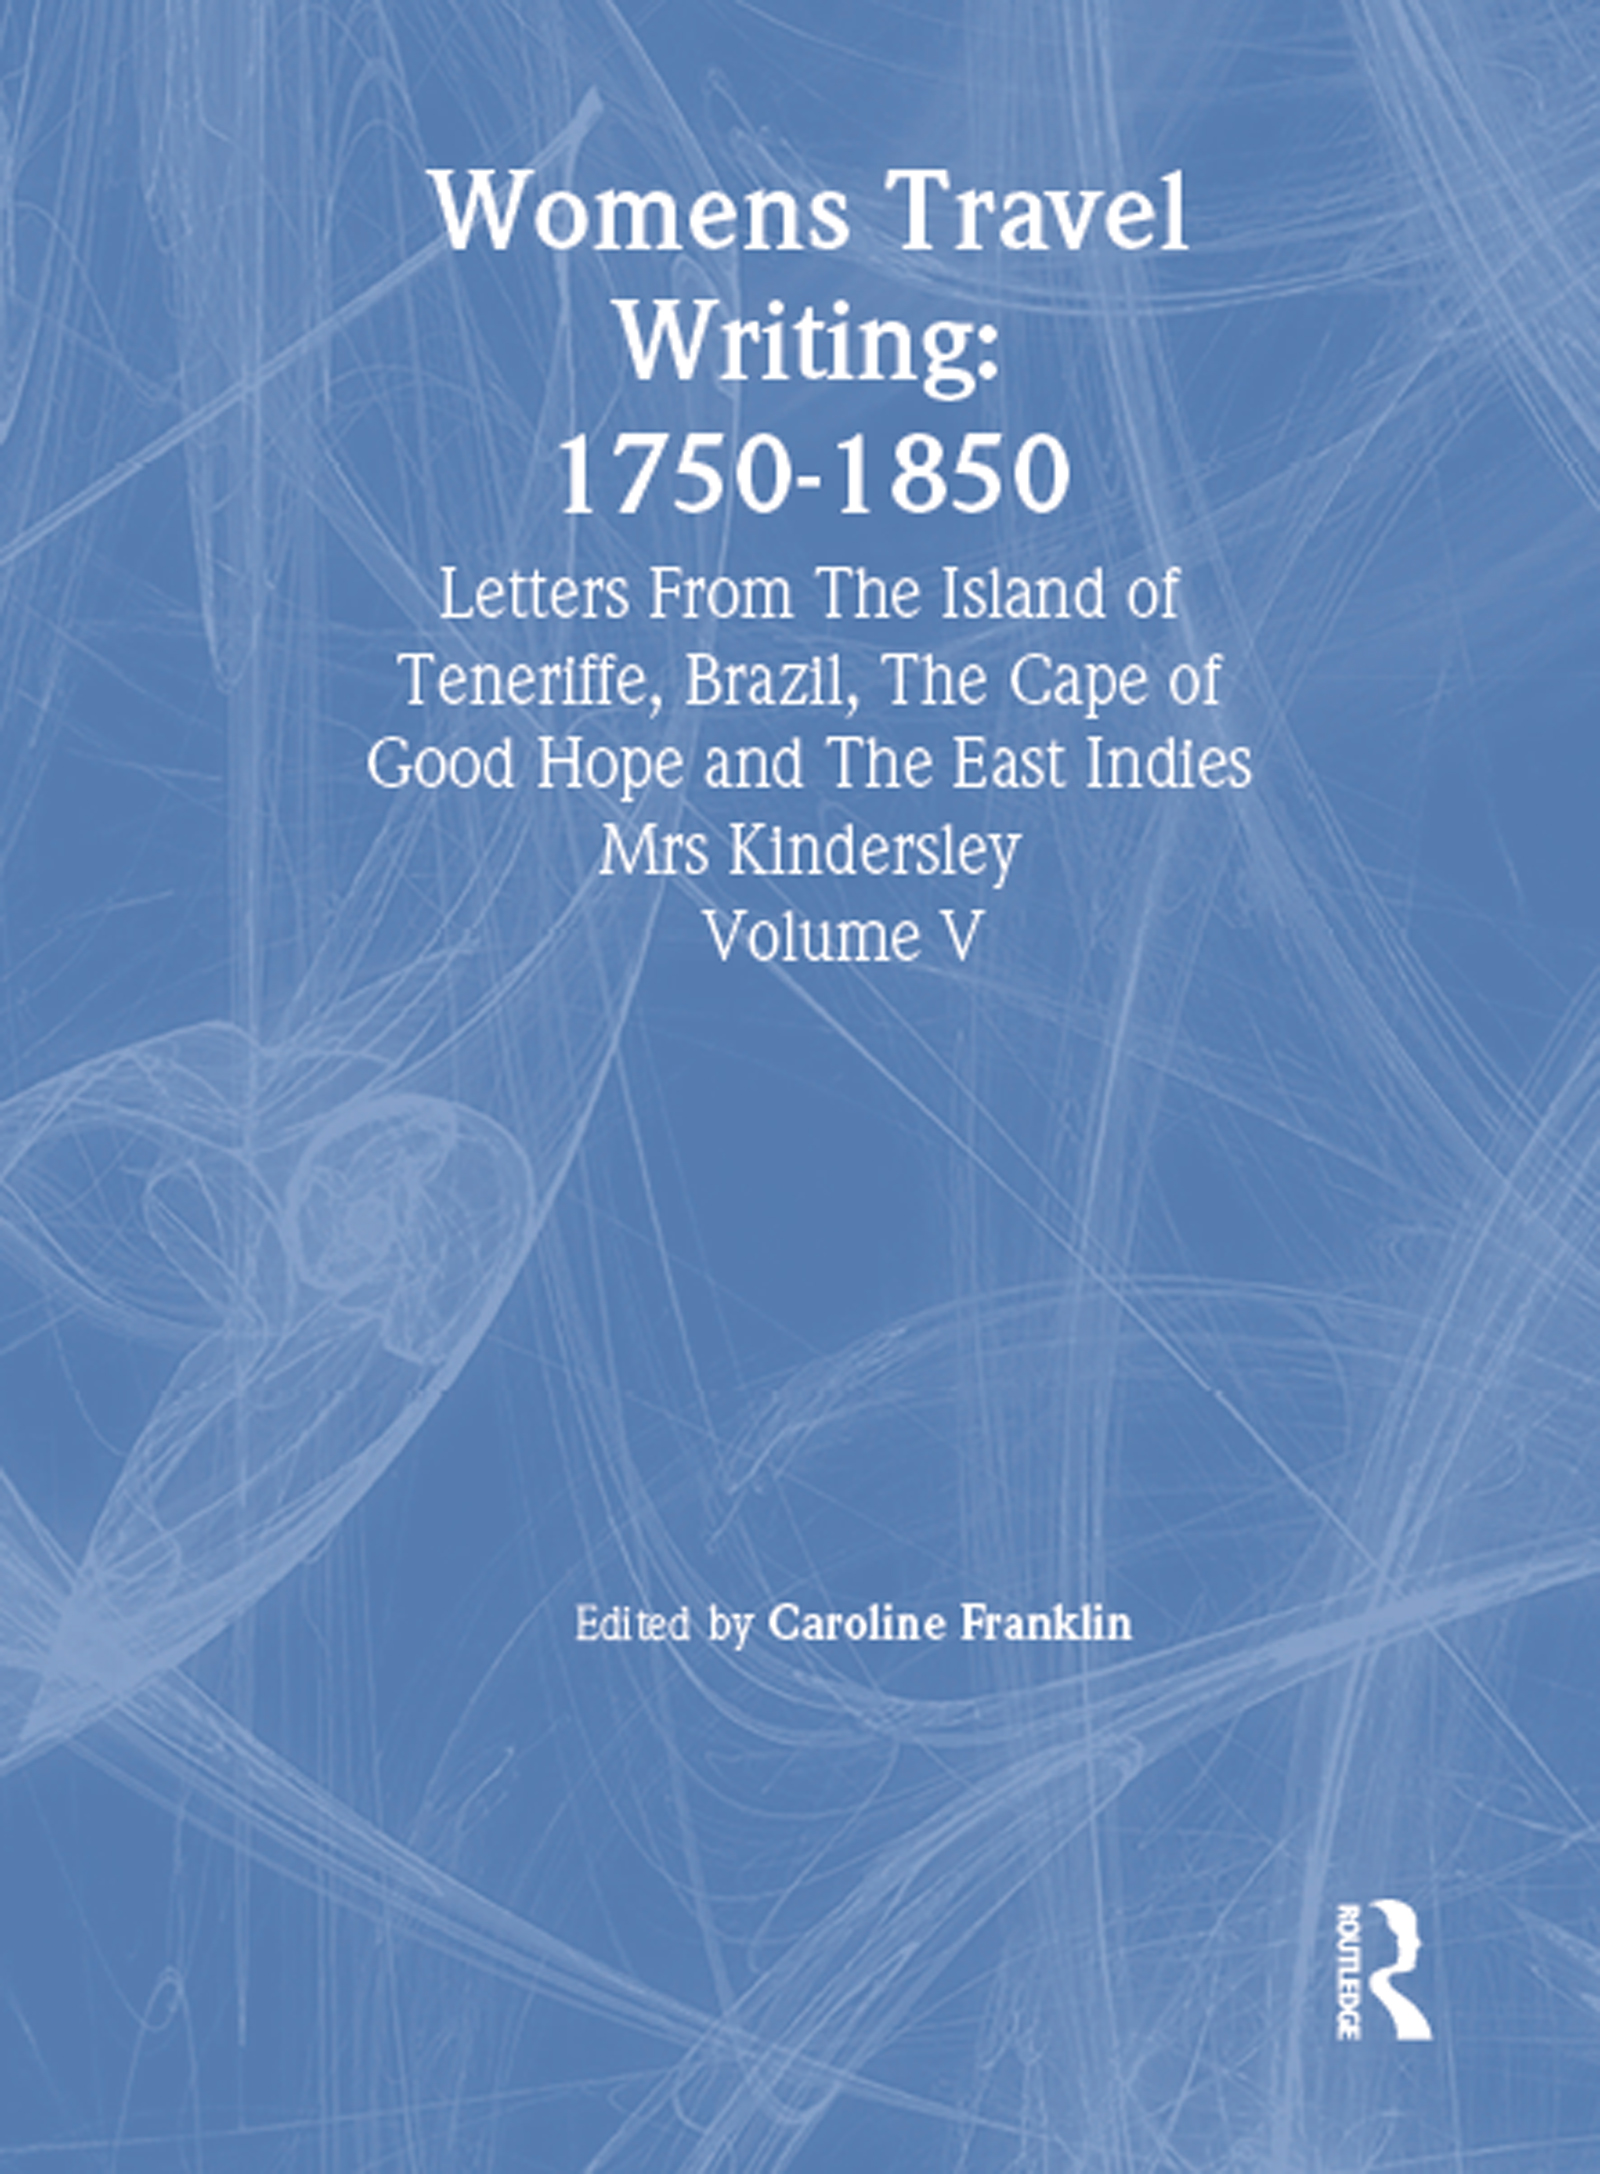 Letter XLVIII